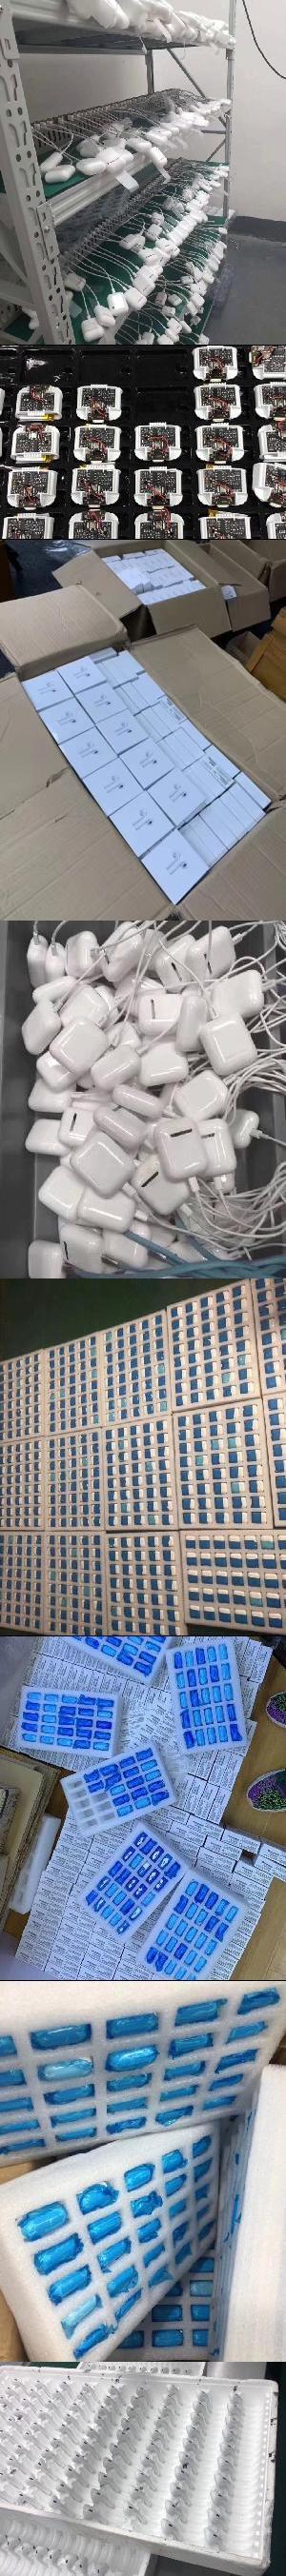 China Grote Fabriek oortelefoon voor apple oordopjes hoofdtelefoon bluetooth hoofdtelefoon zonder draad Fabriek Verkoop Direct